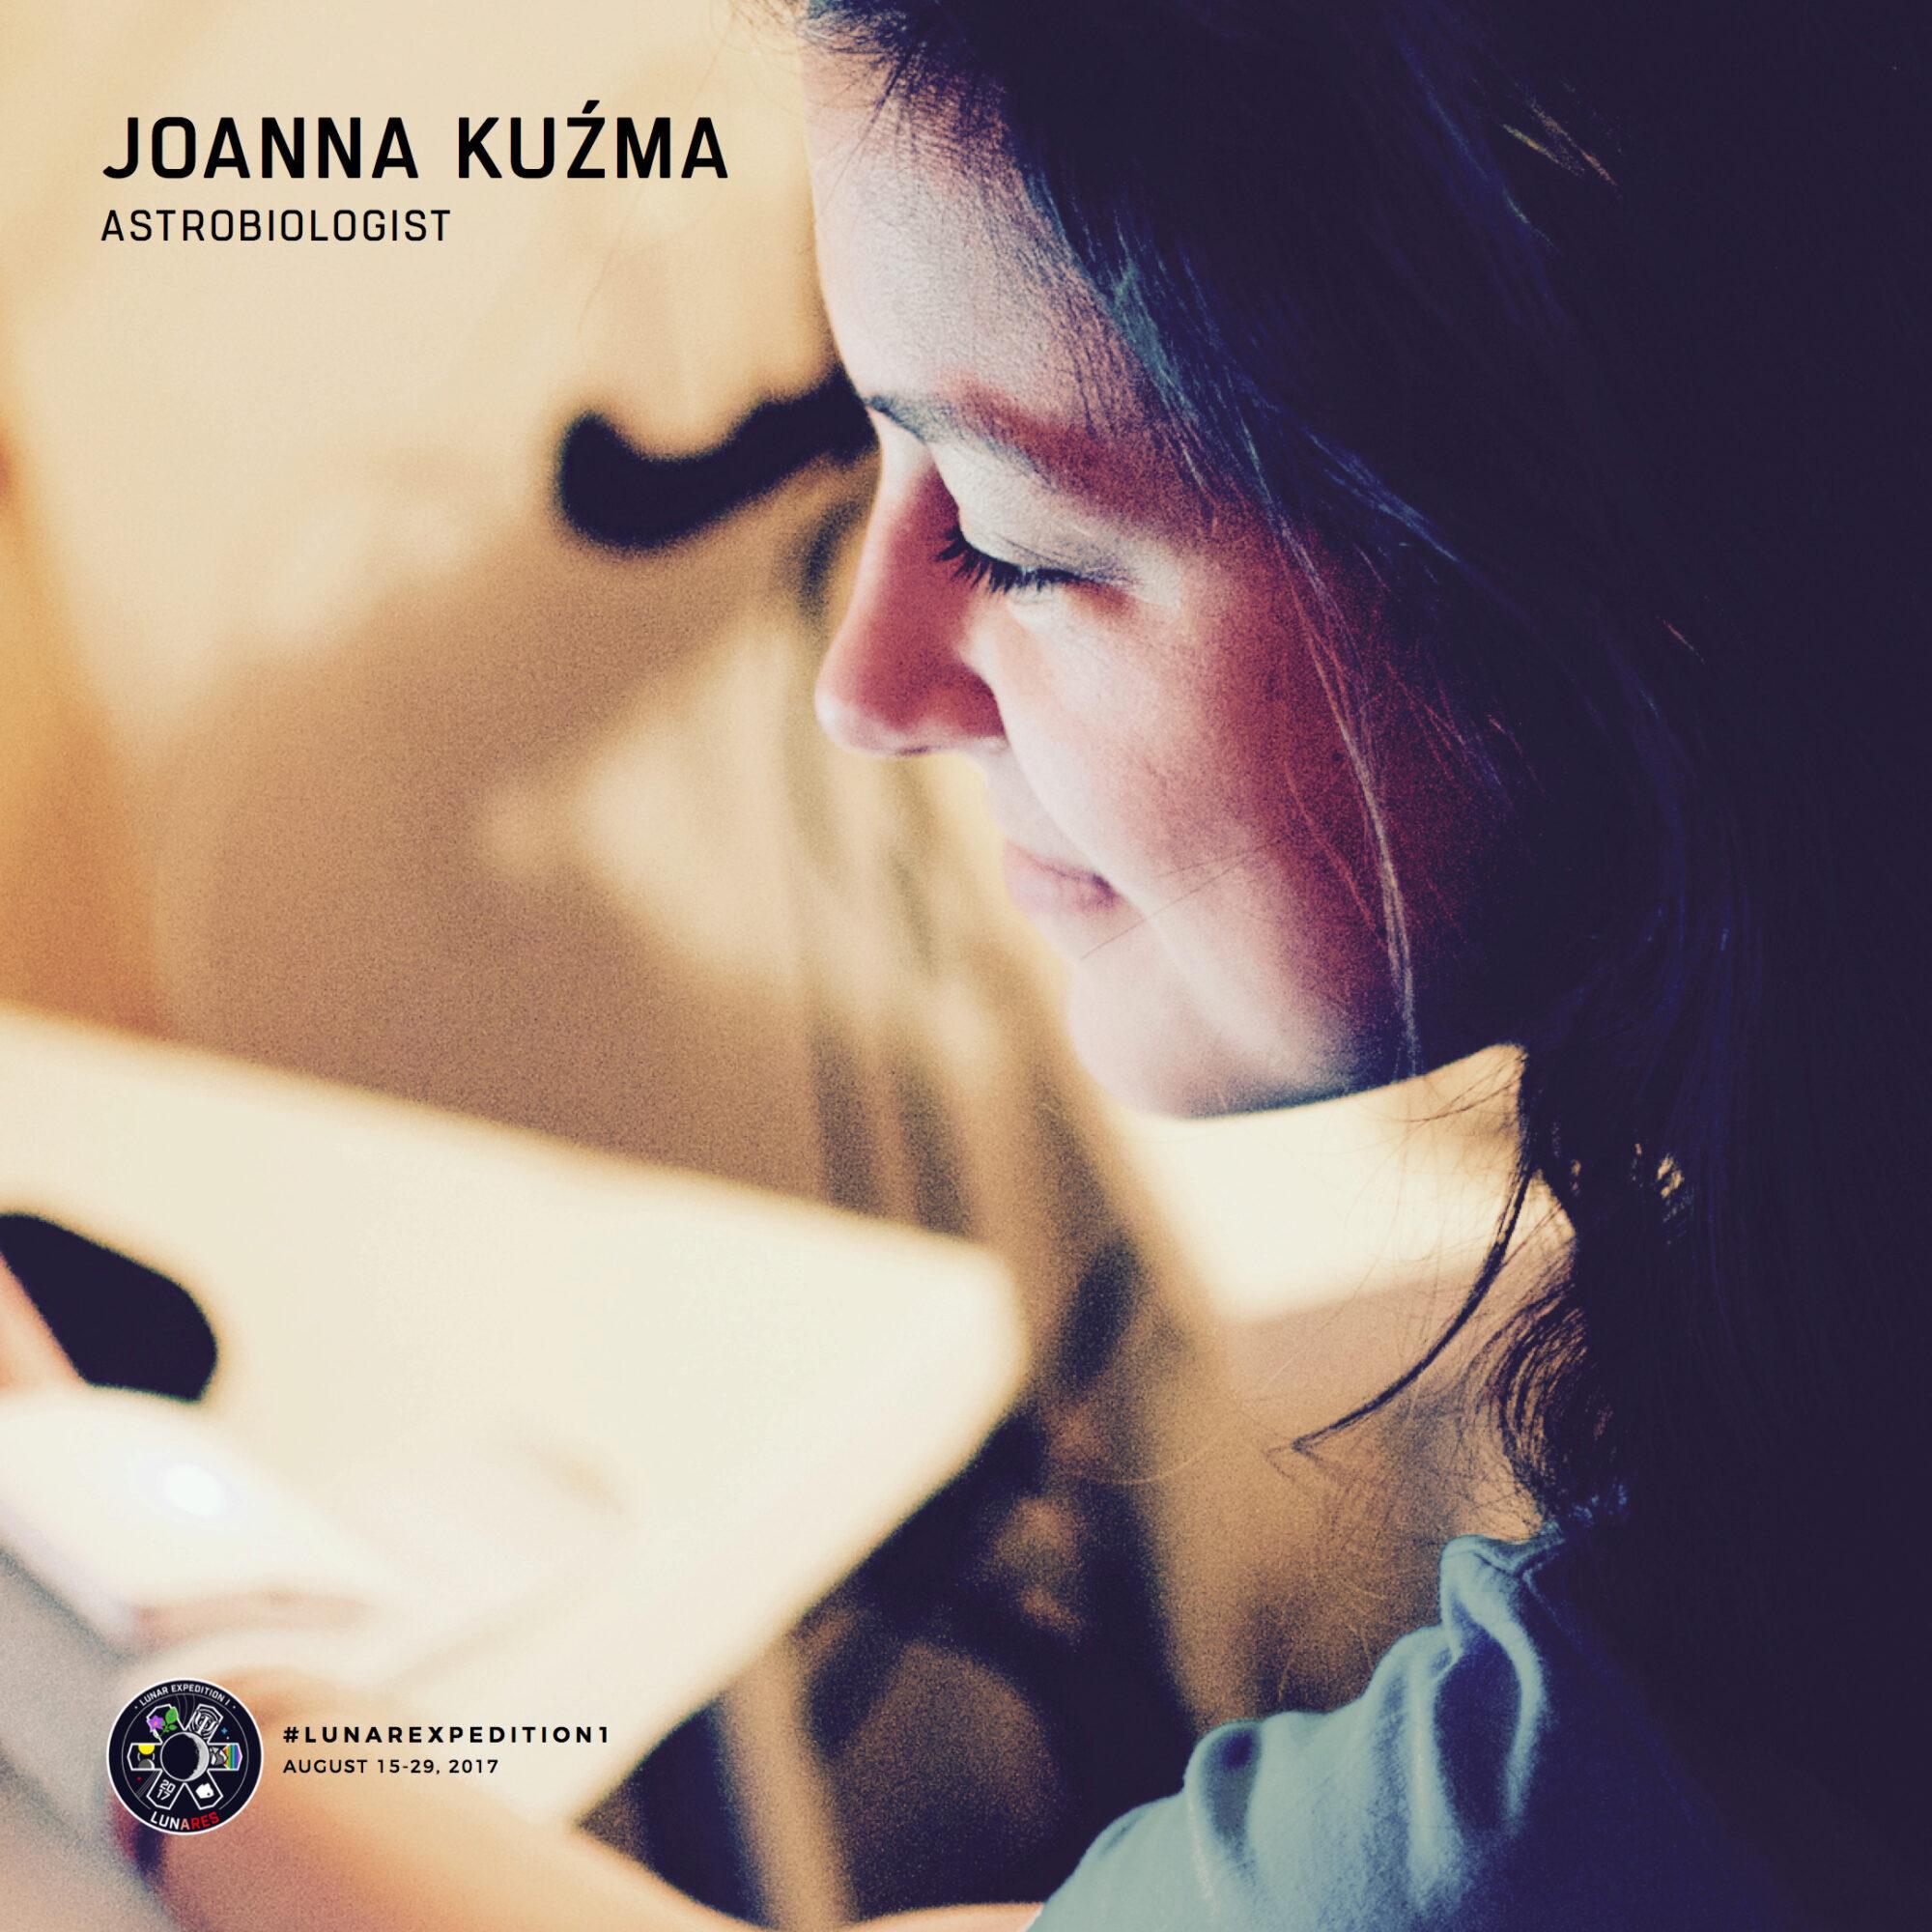 lunar-expedition-01/jkuzma-profile.jpg